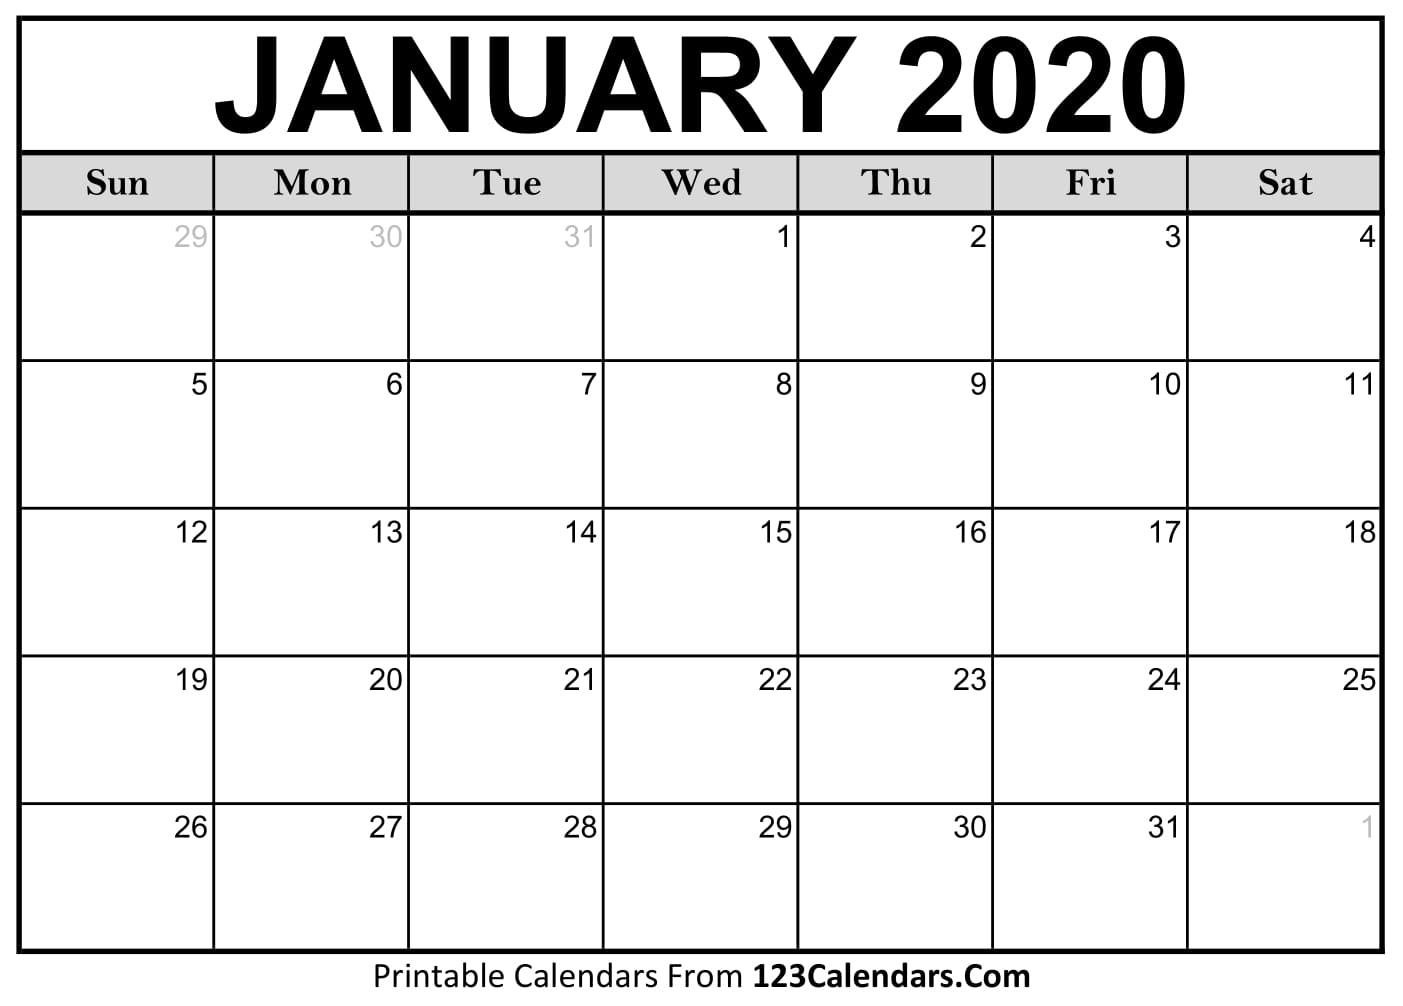 Free Printable Calendar | 123Calendars throughout Printable Calendars From 123Calendars